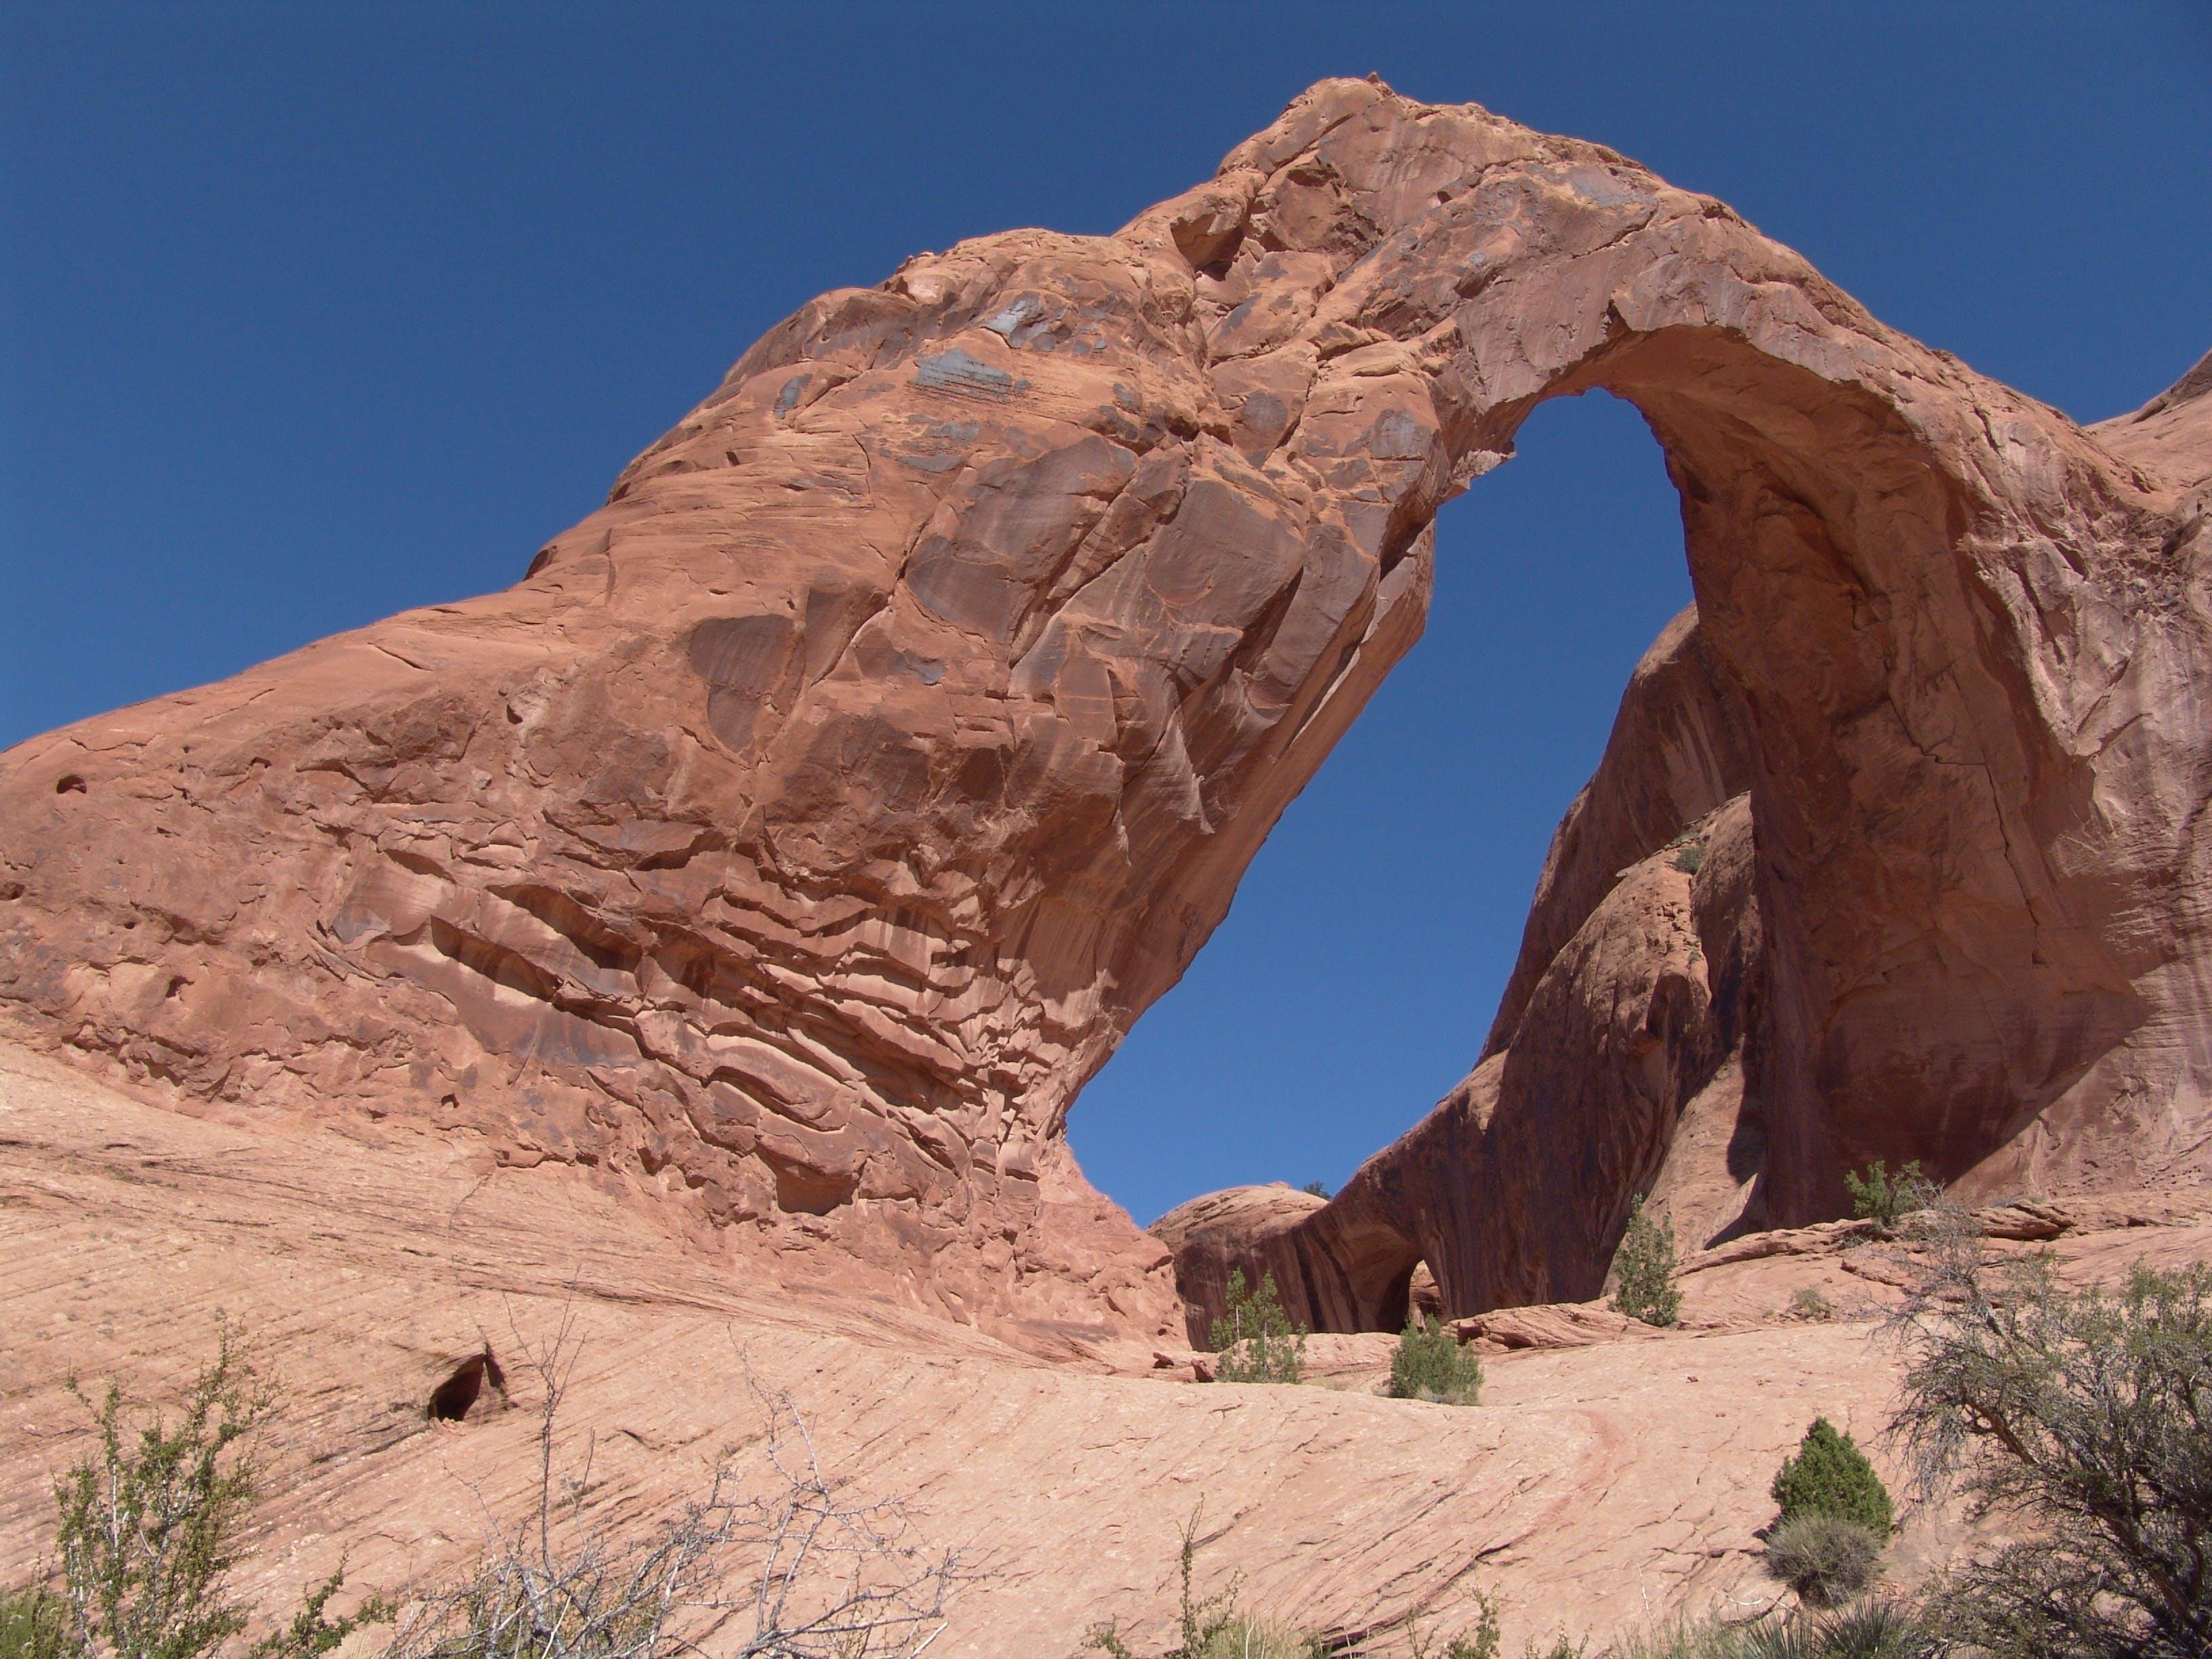 Free stock photo of landscape, nature, hiking, rock